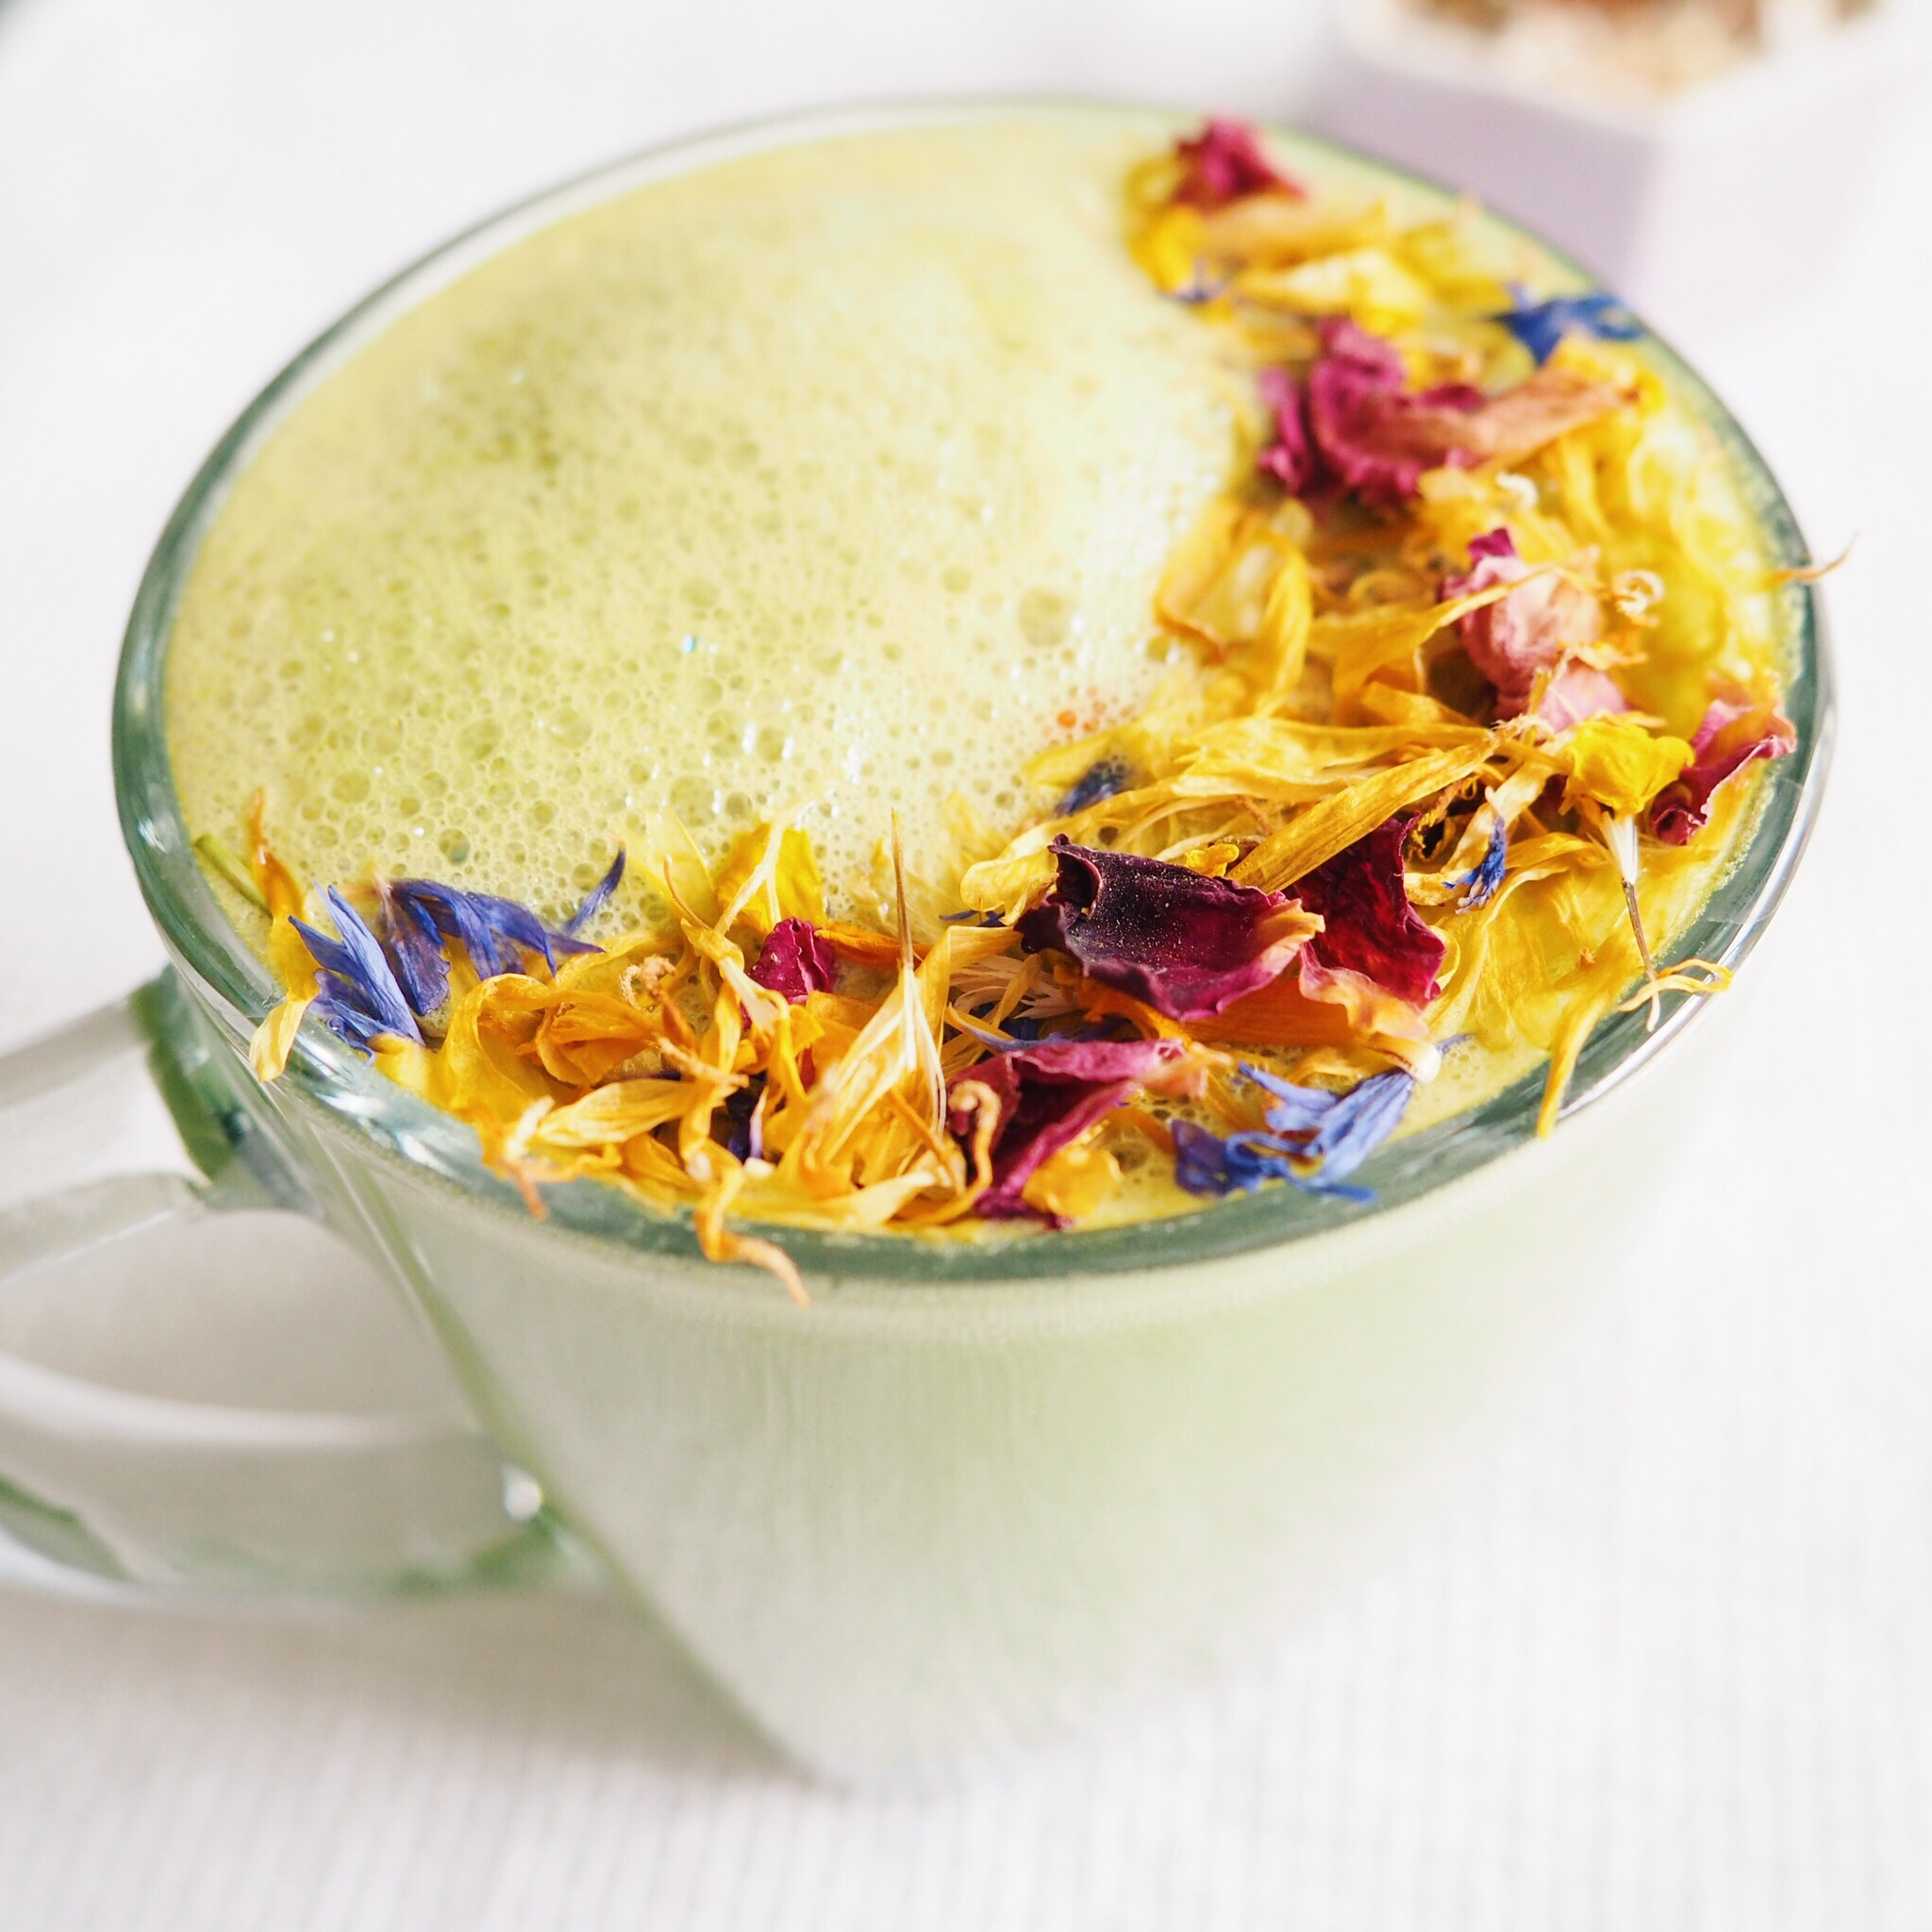 Green tea latte.jpg